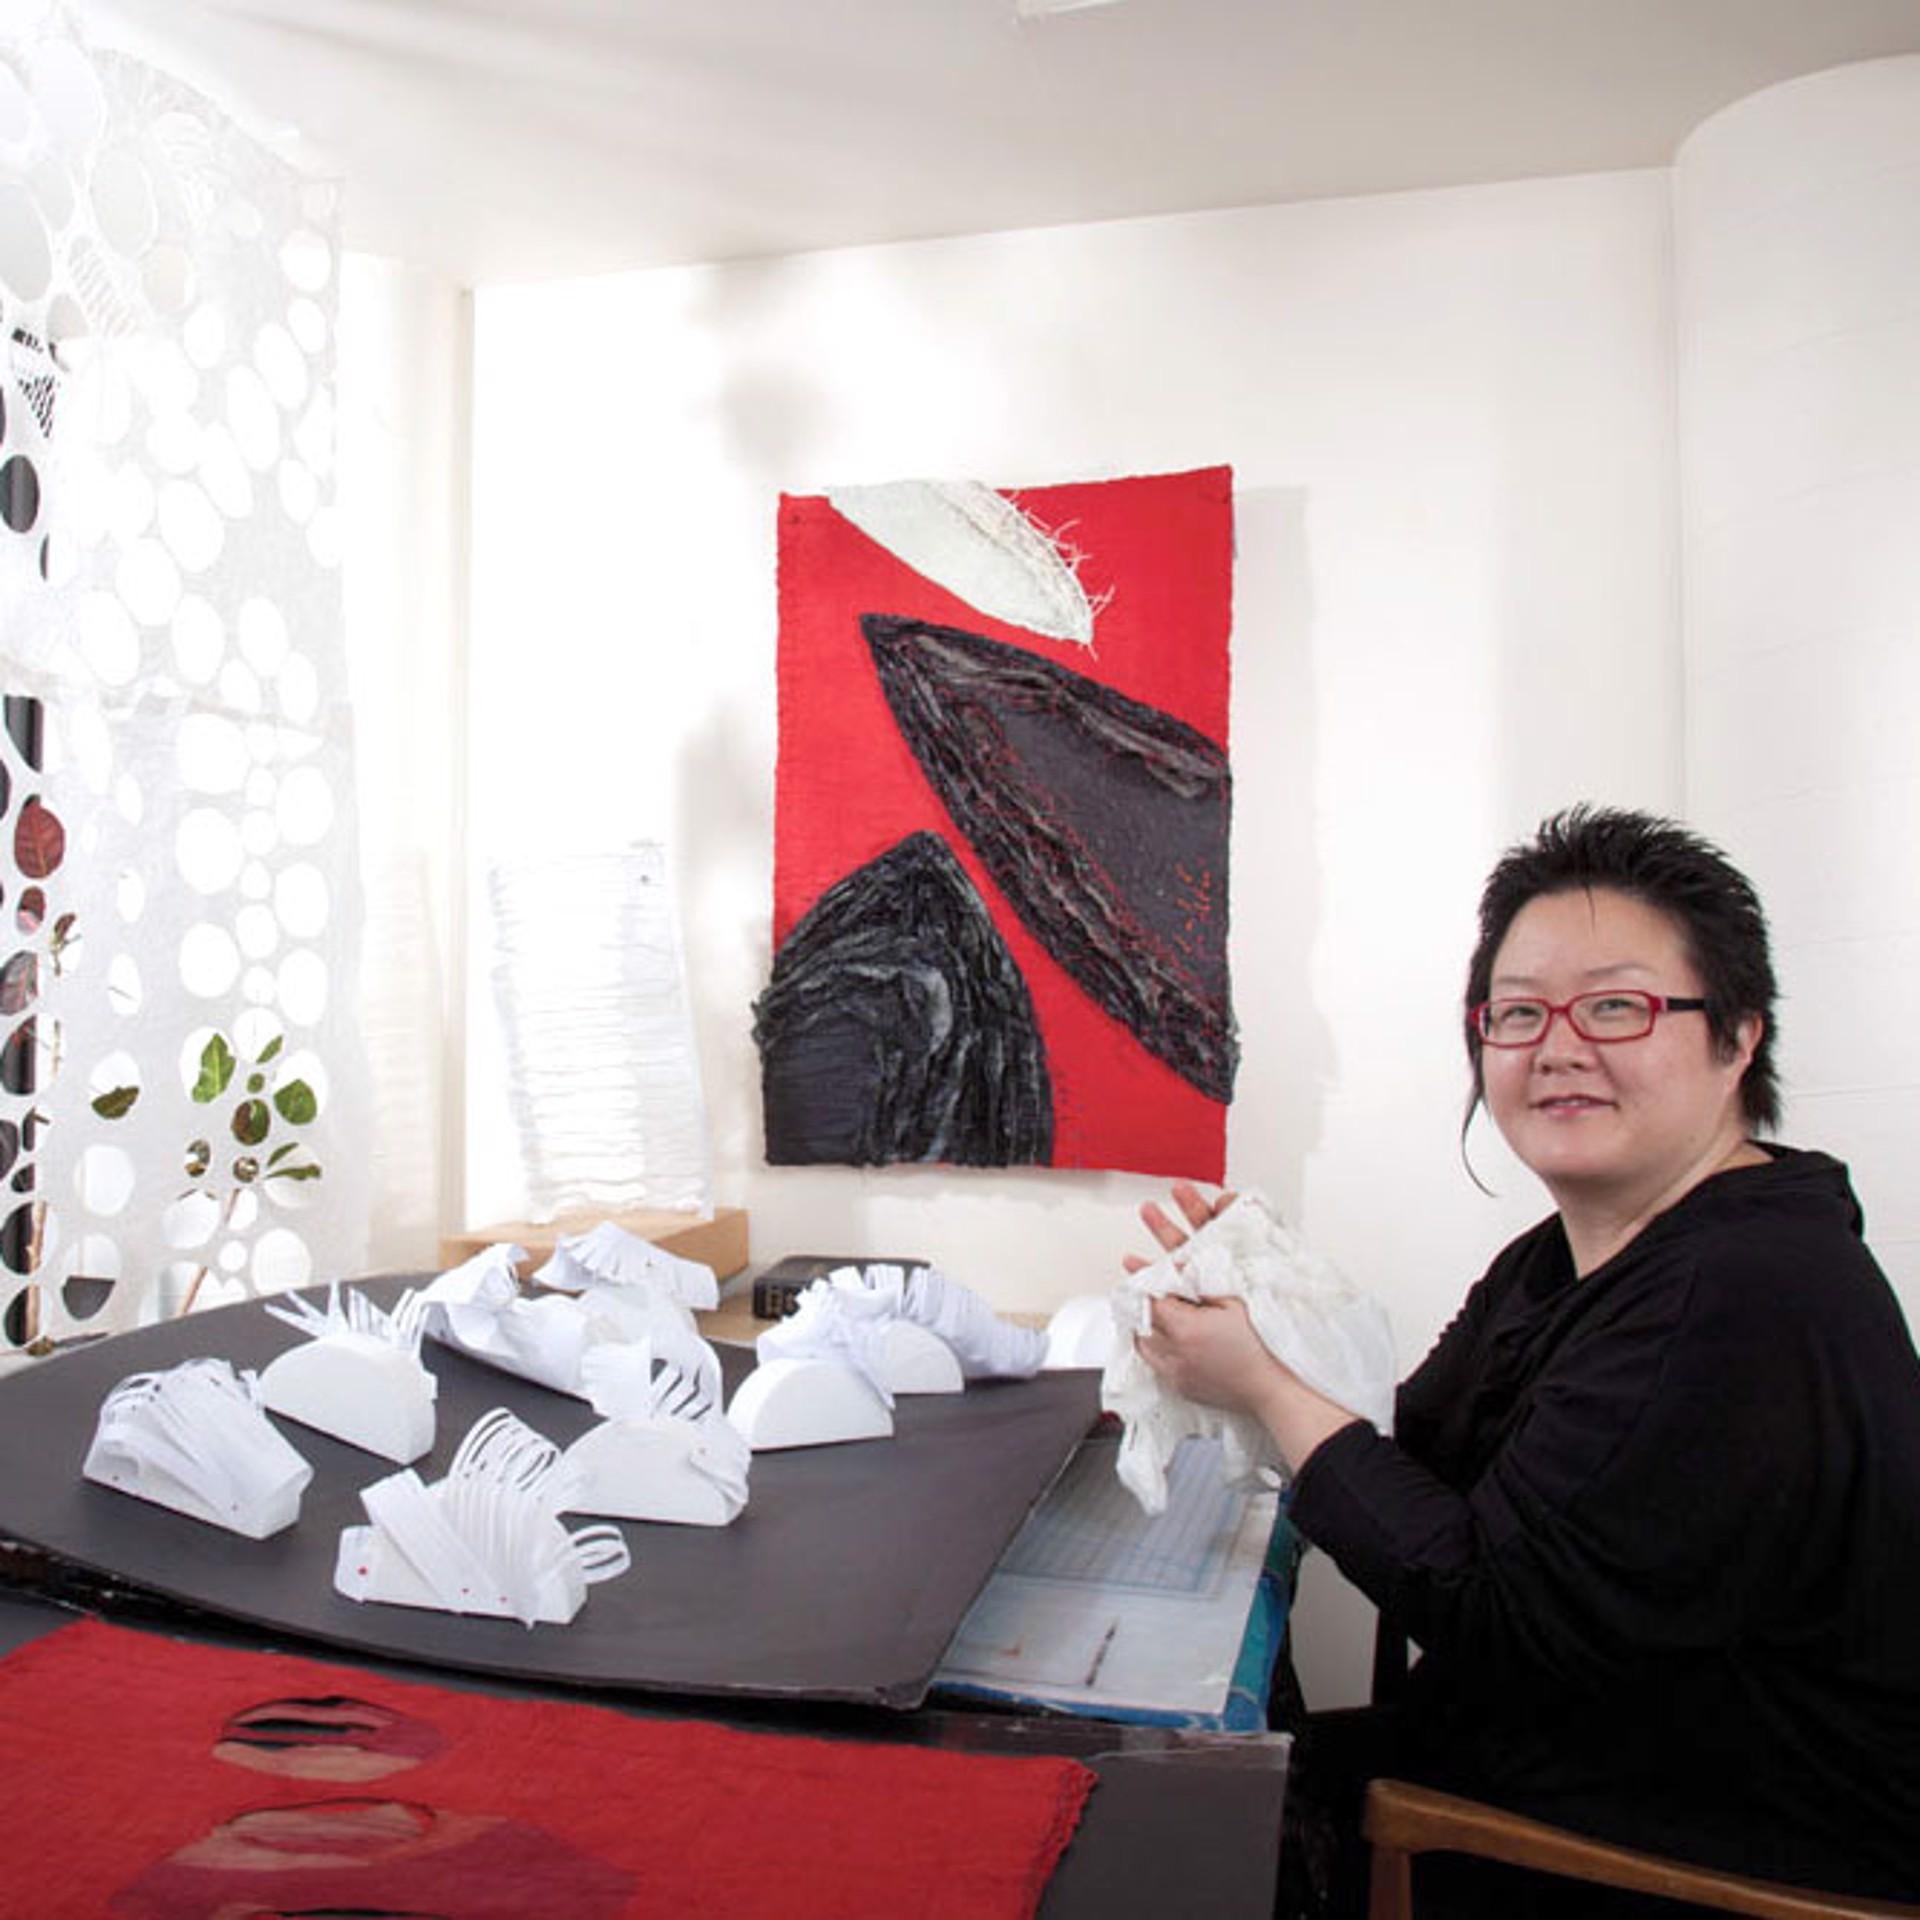 Jiyoung Chung